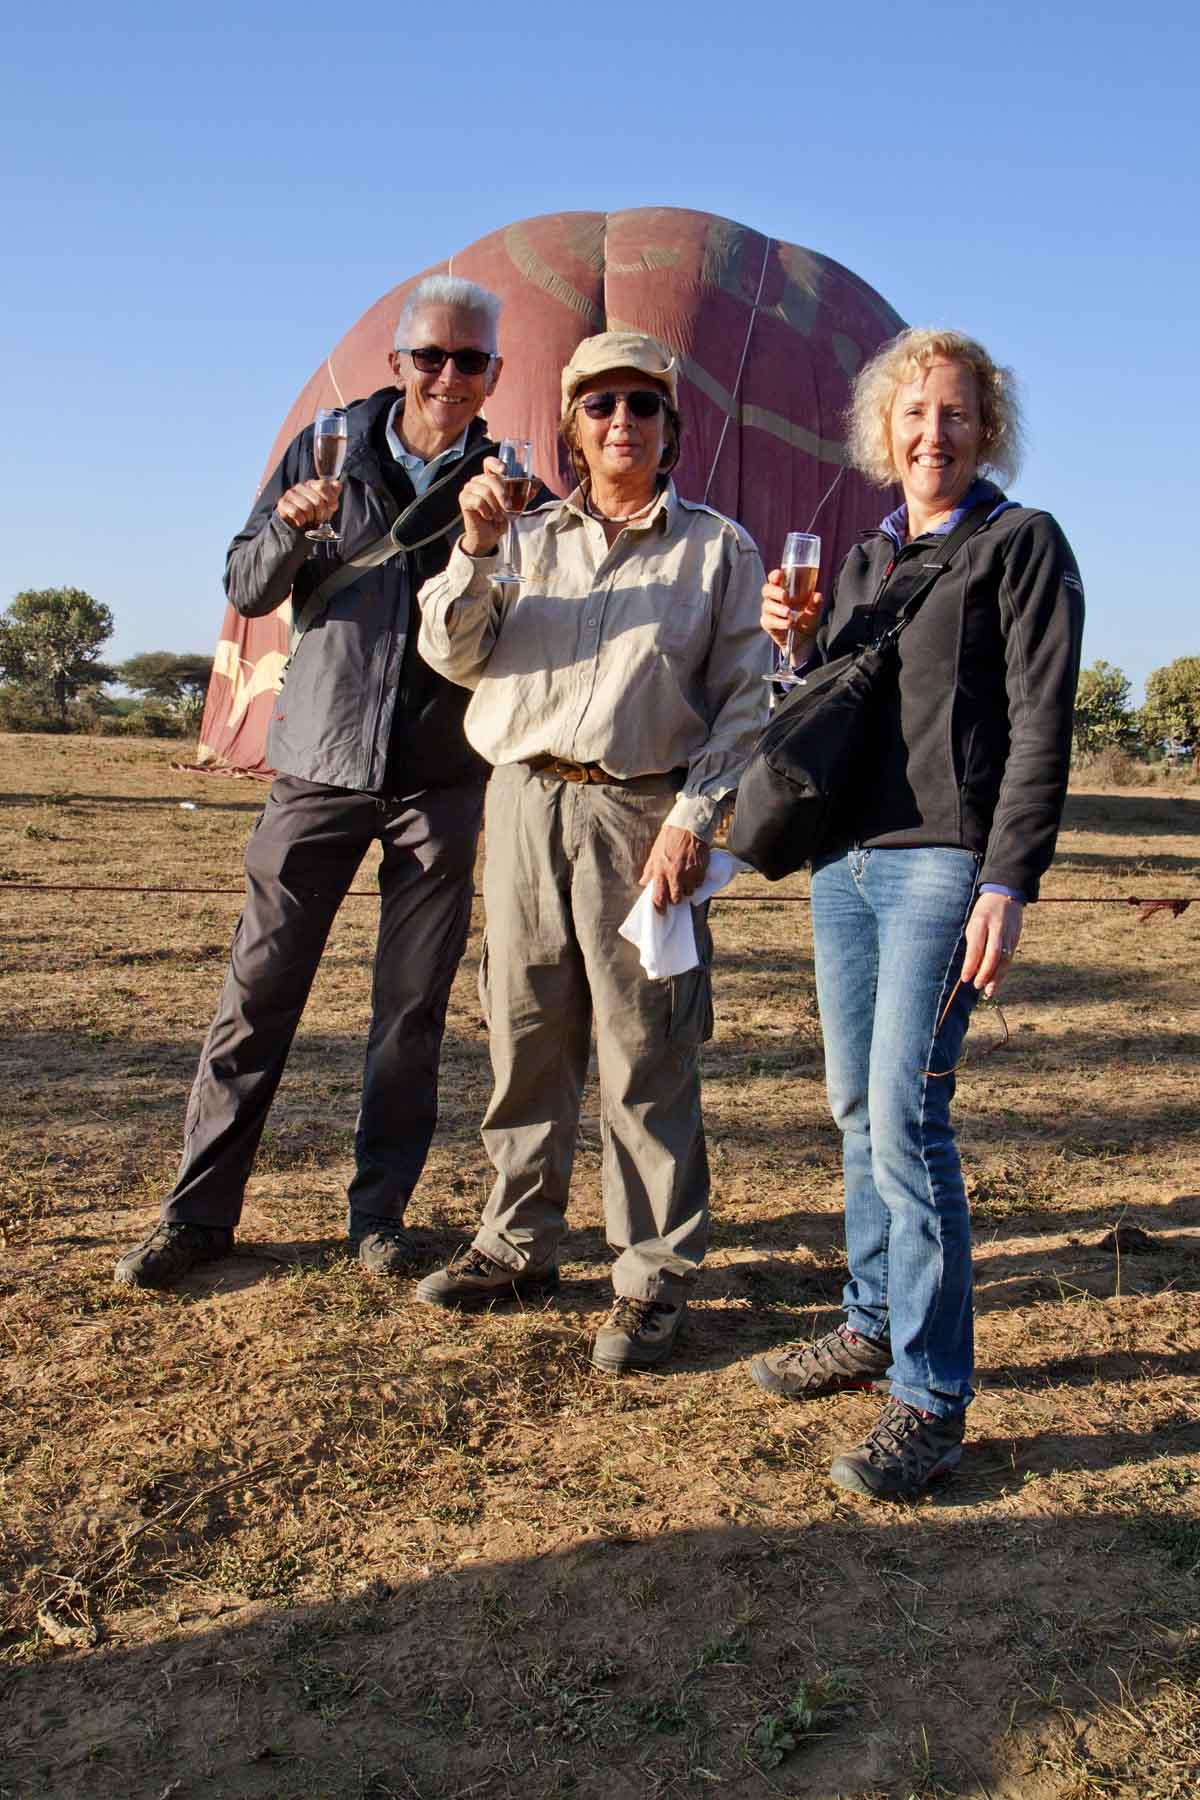 John, Pilot Sue, Nic and champagne - a safe landing always deserves a celebration!